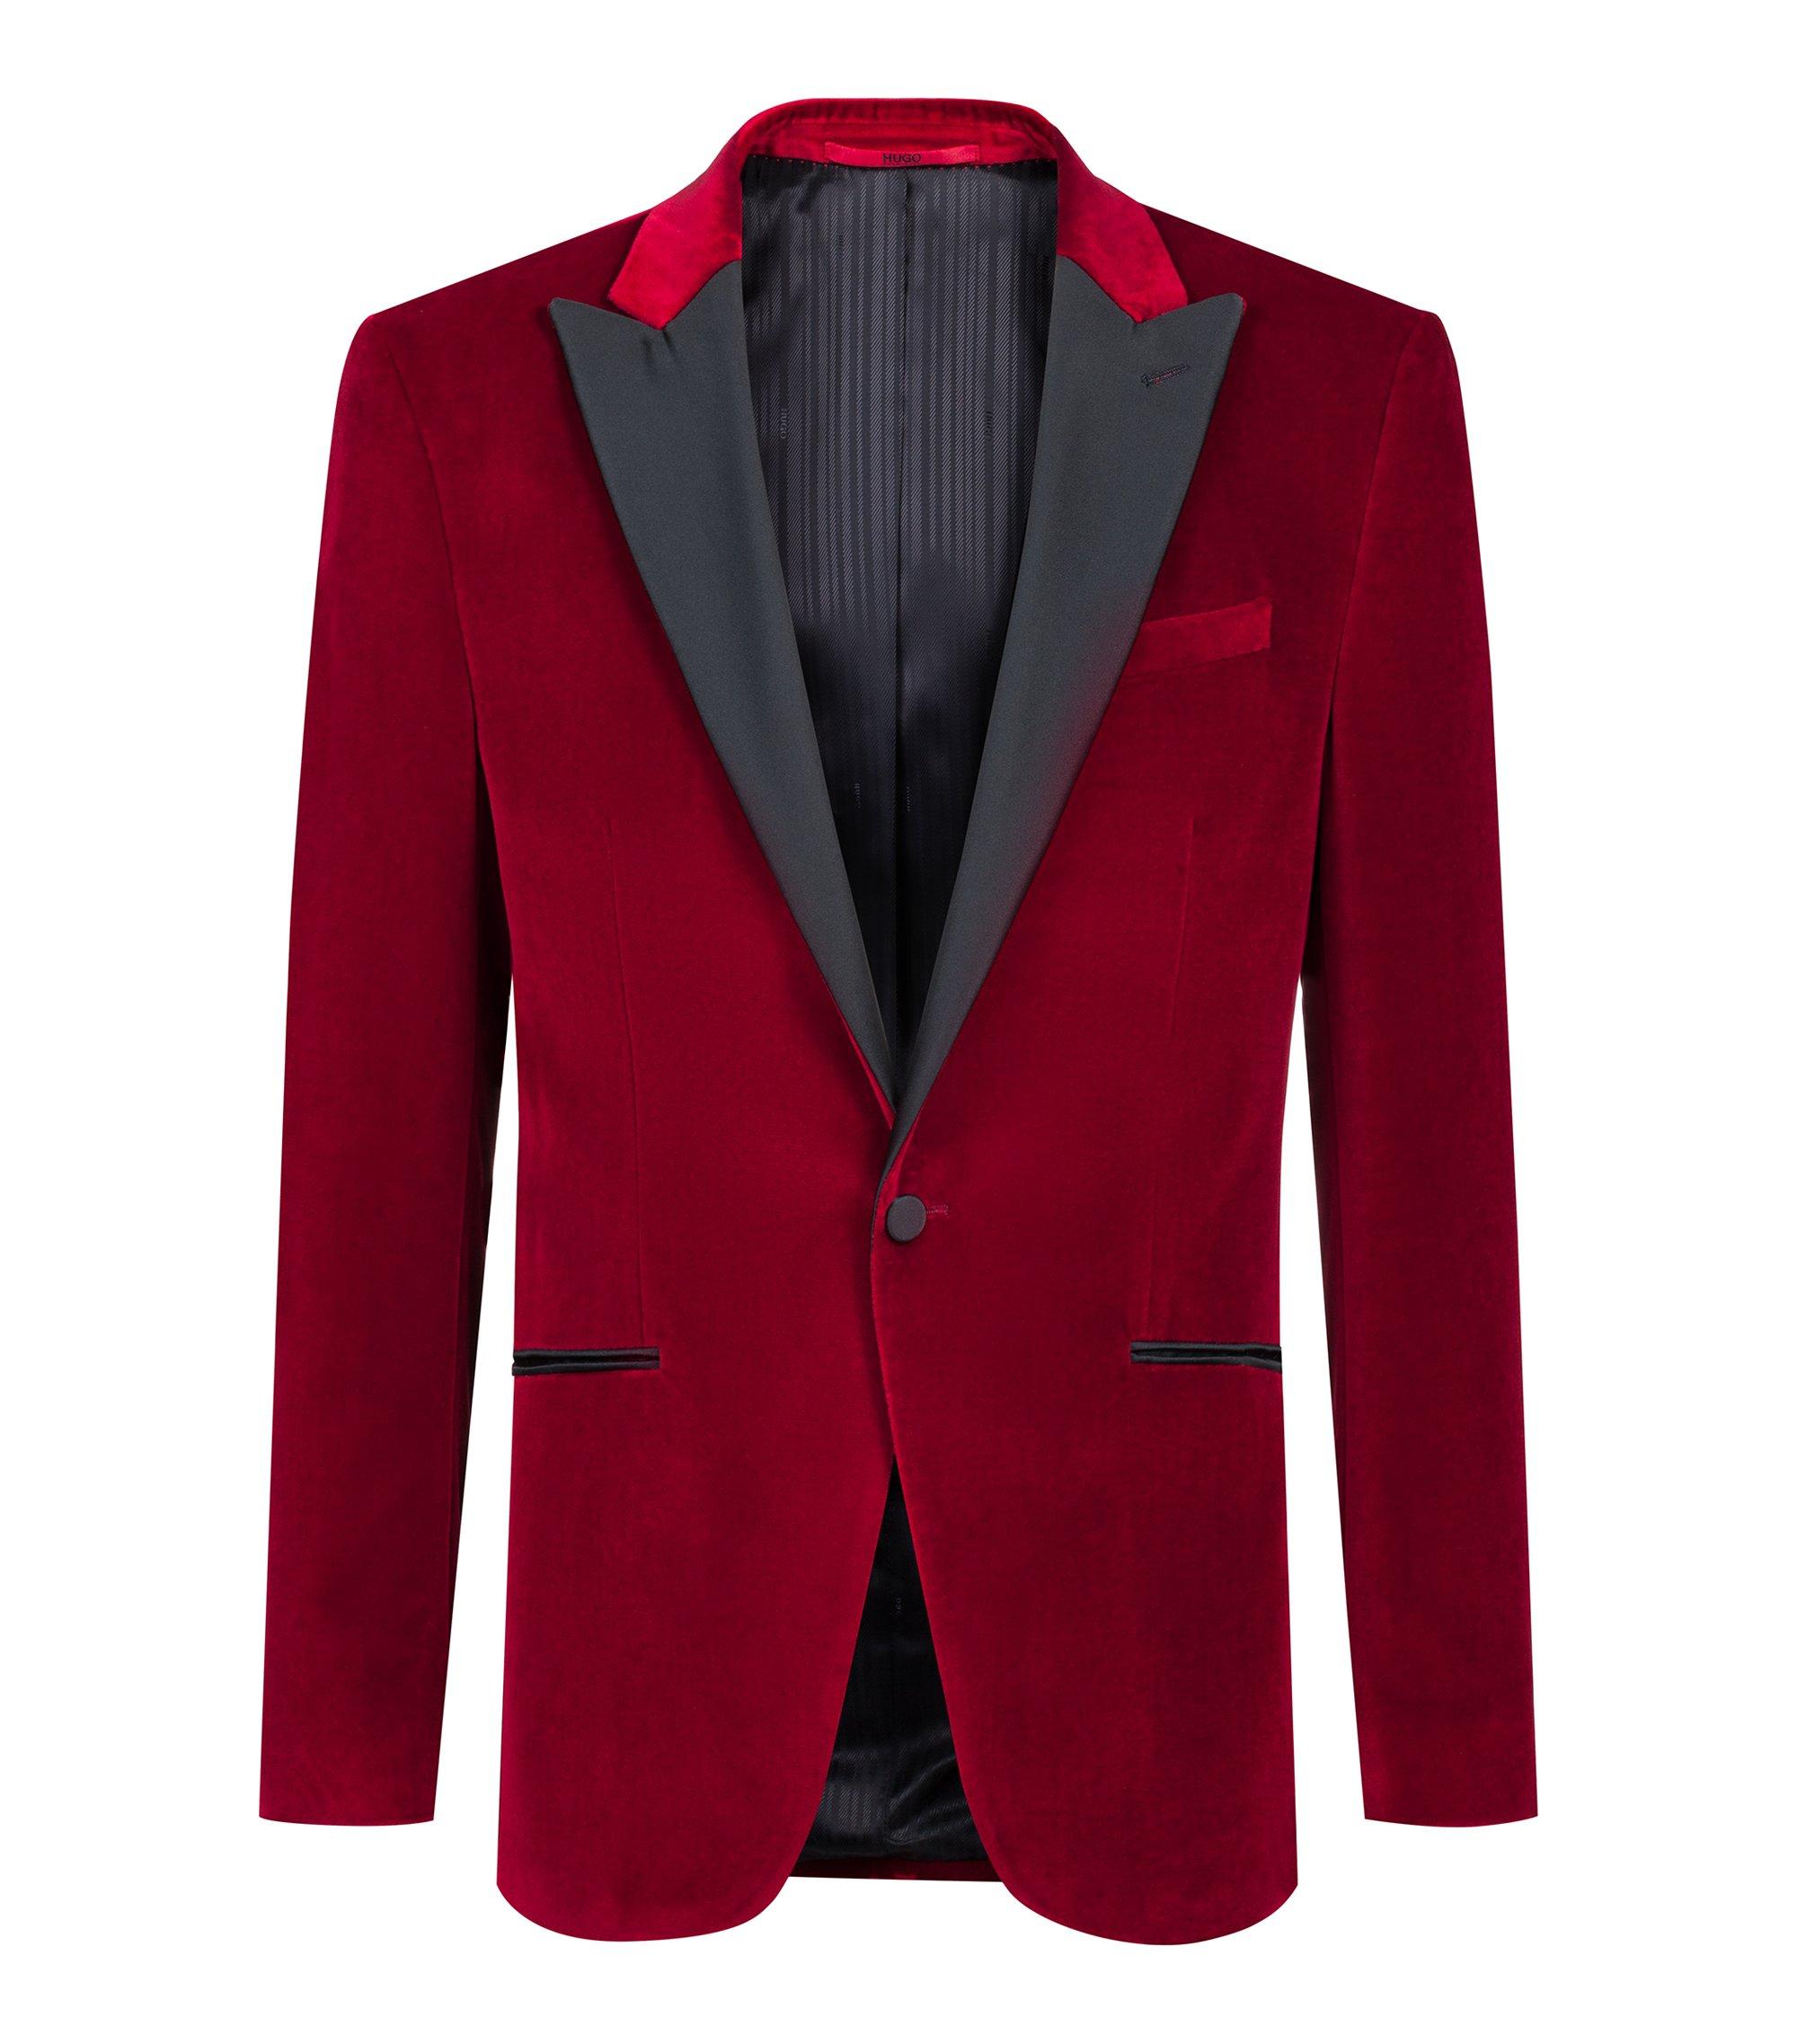 Slim-Fit Smokingjacke aus Samt mit steigendem Revers, Rot